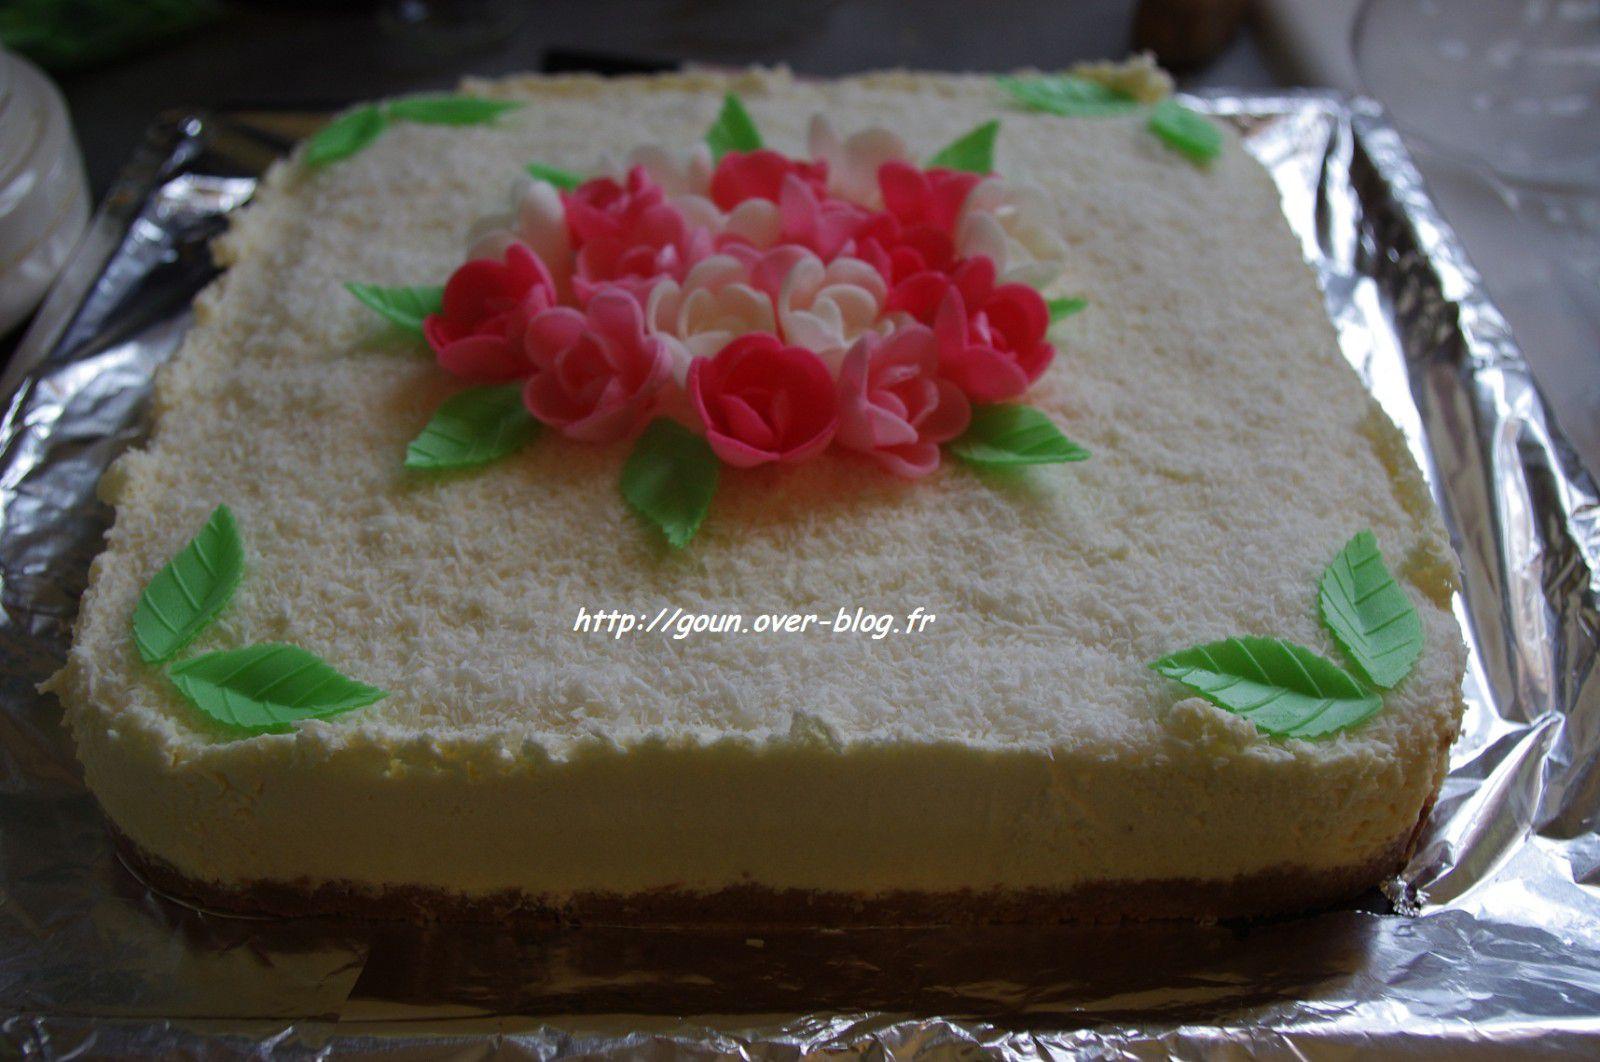 Mars 2011 : pâtisserie traditionnelle - Page 9 IMGP0356---Copie